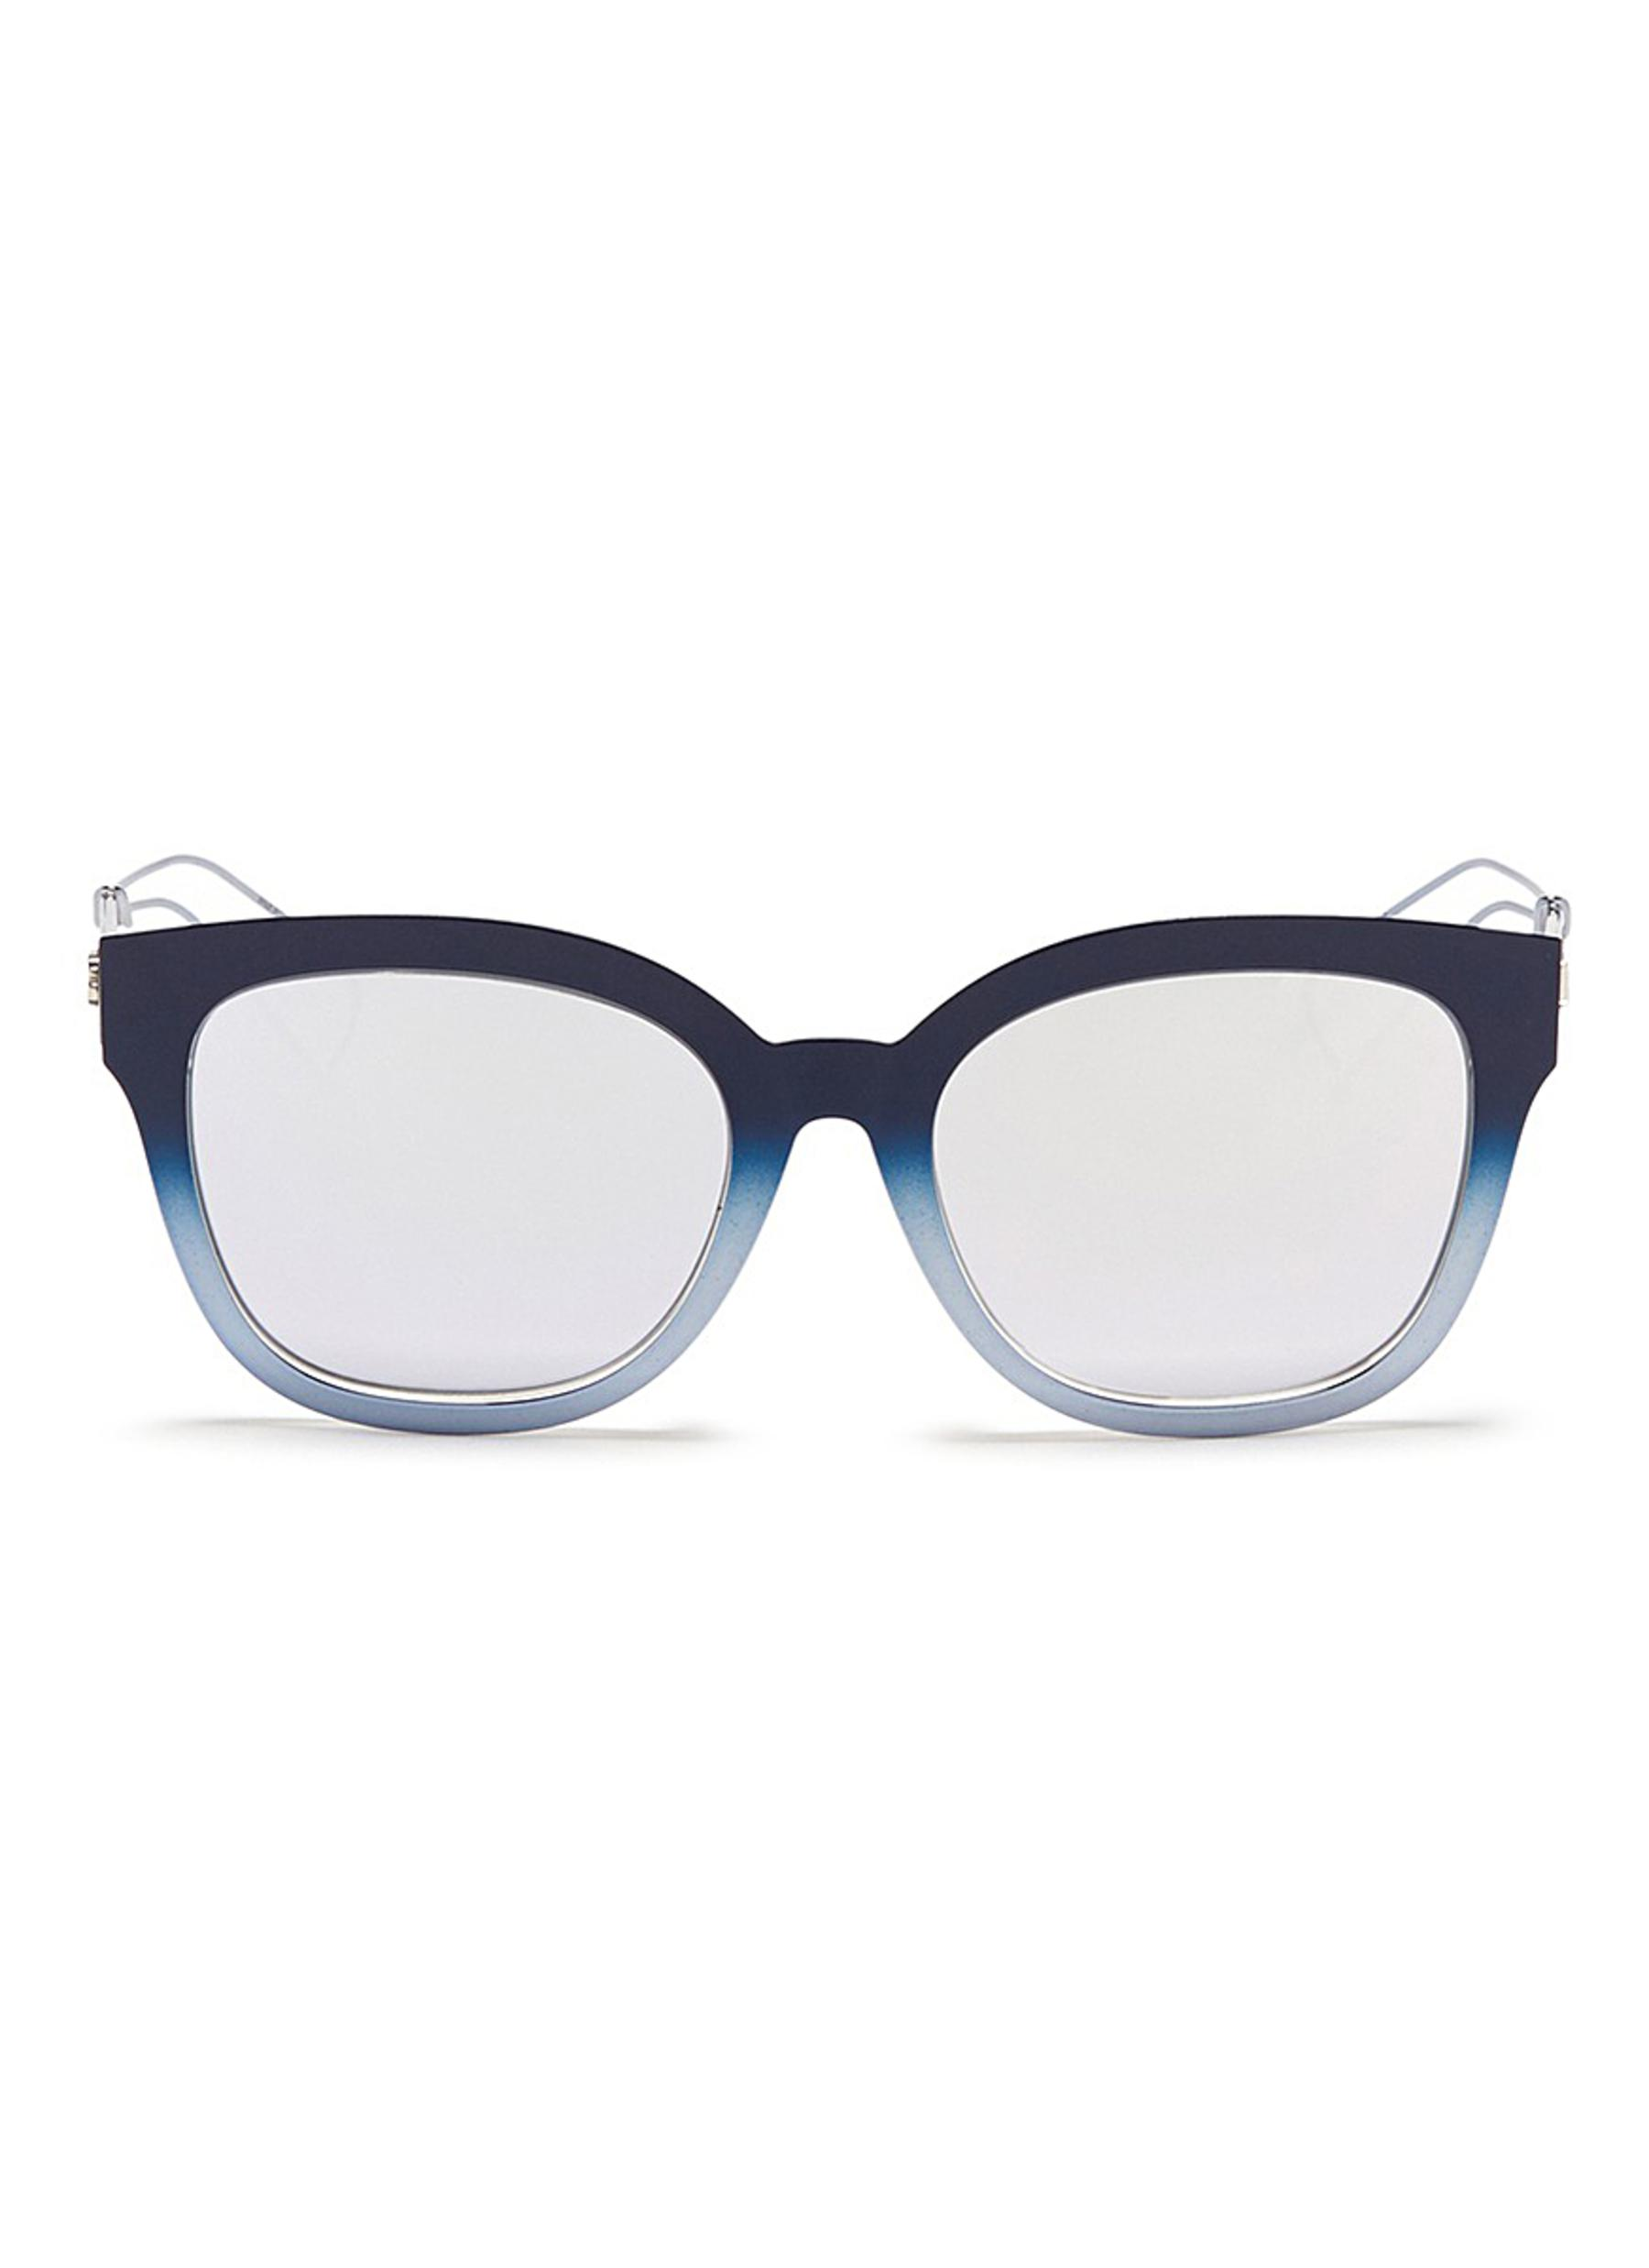 17c46069c6e8 Dior.  Diorama 1  degradé metal openwork temple mirror sunglasses